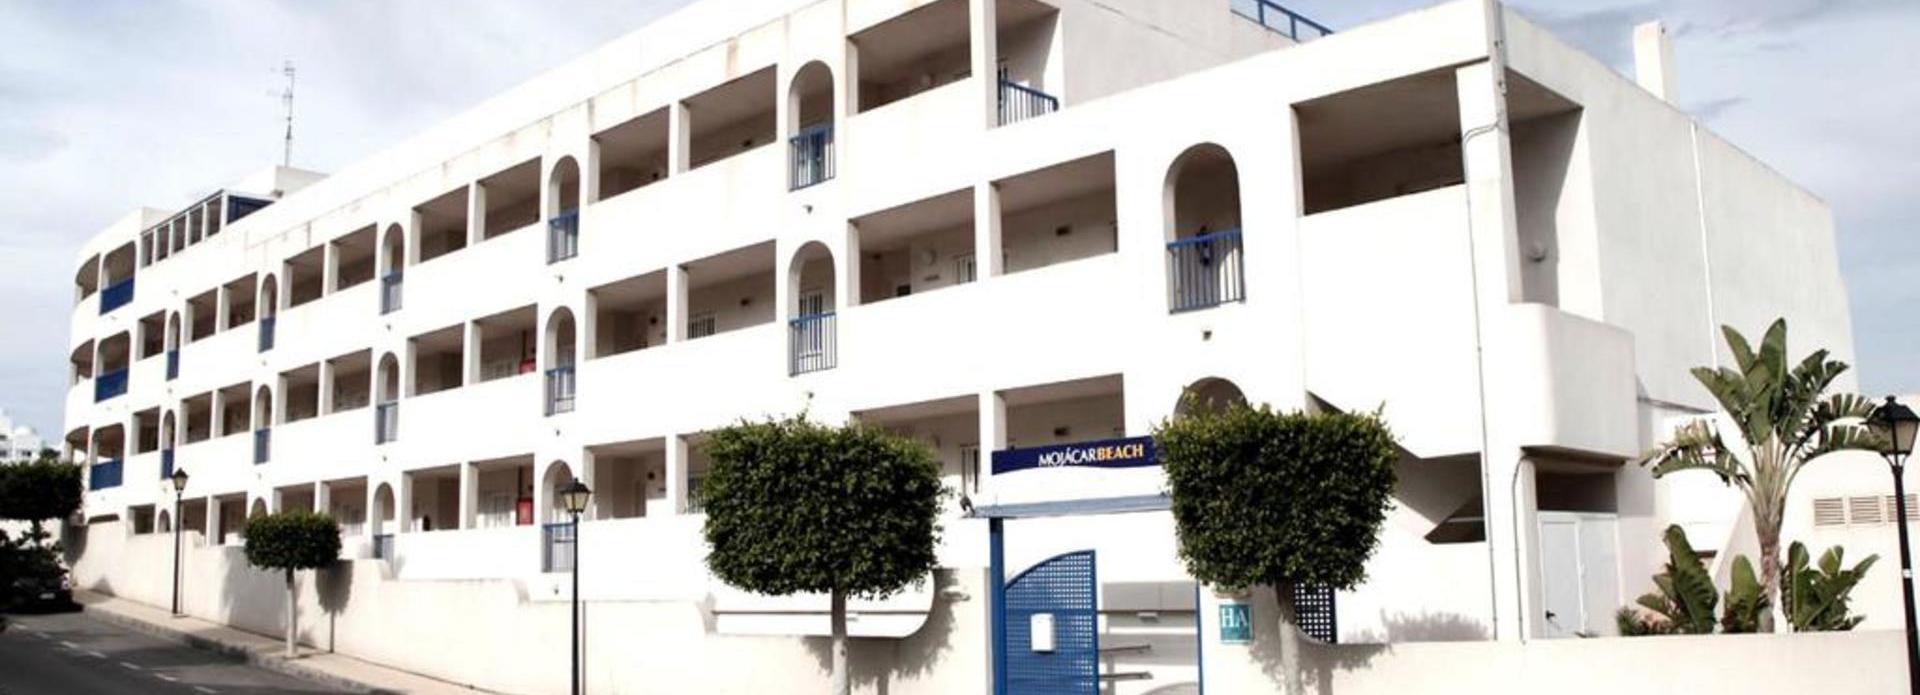 Hotel Mojácar Beach